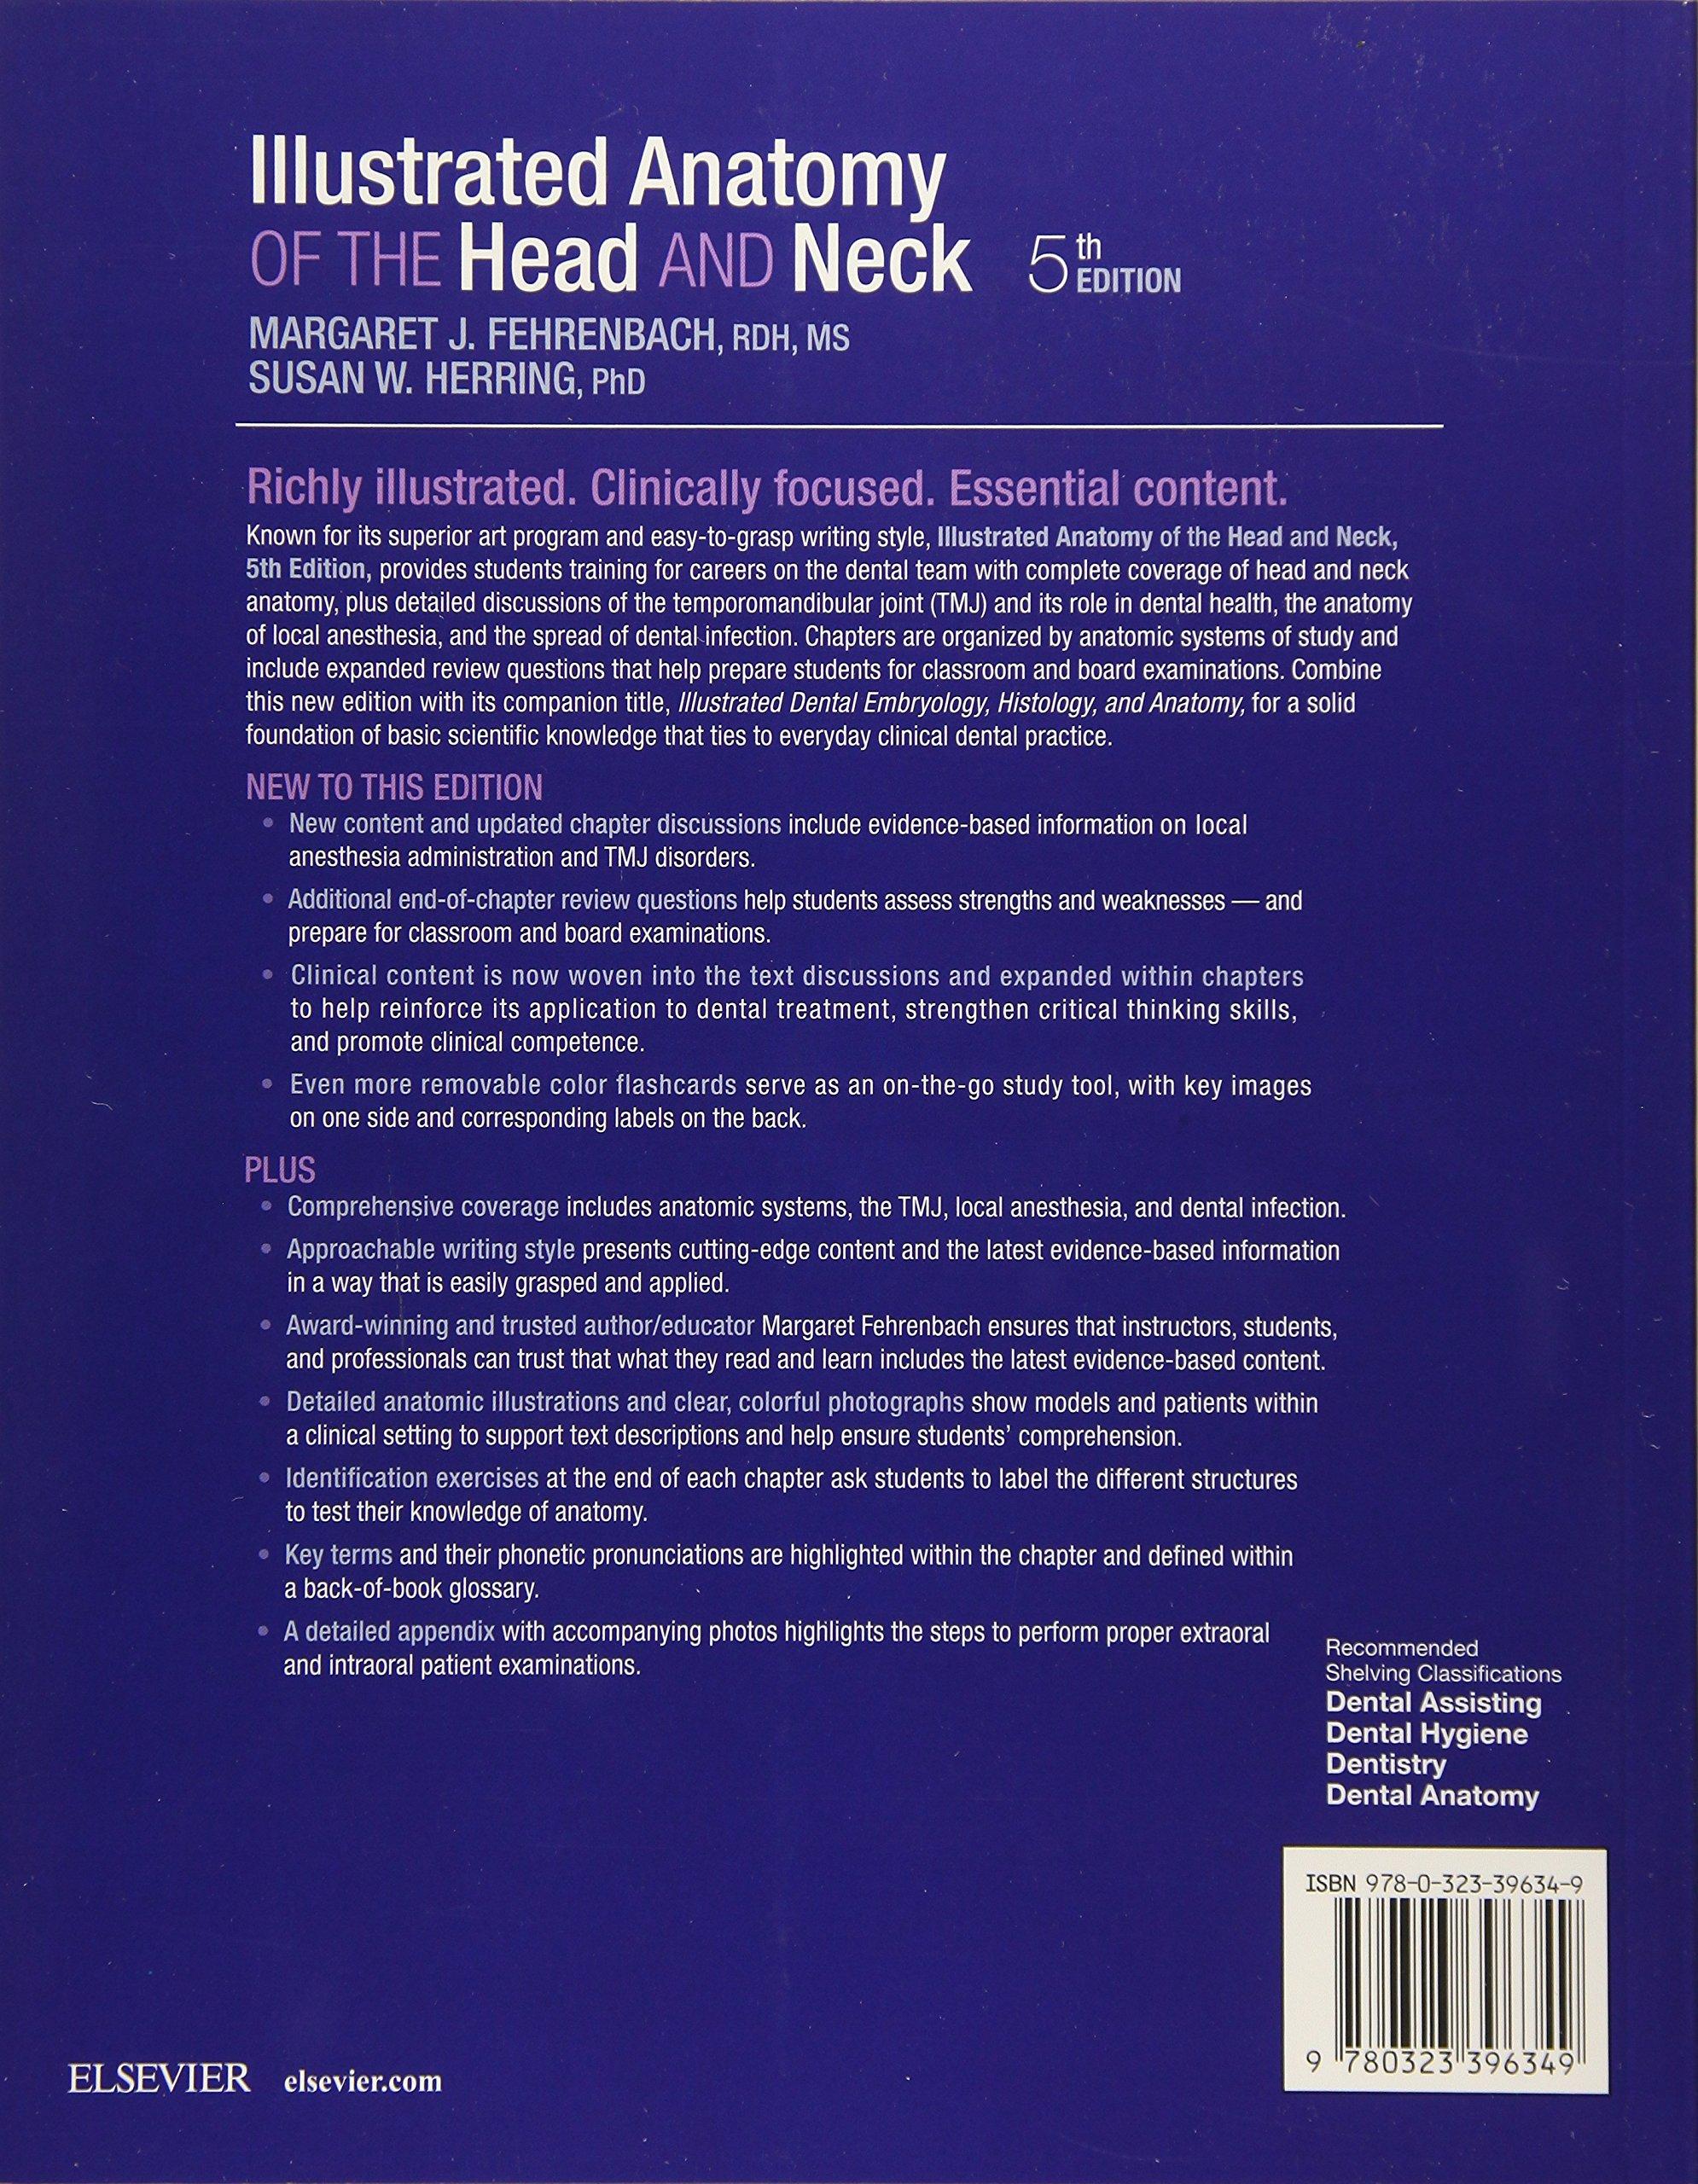 Illustrated Anatomy of the Head and Neck, 5e: Amazon.co.uk: Margaret ...